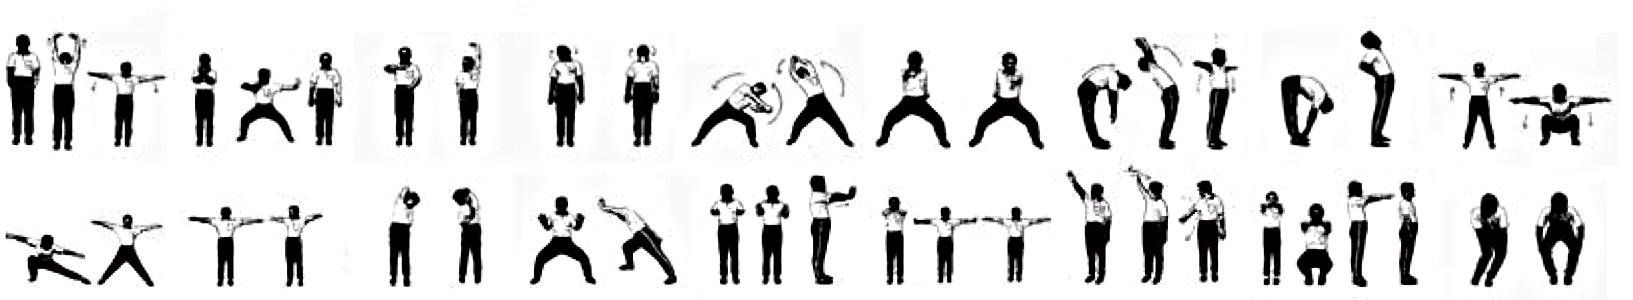 18-Lohan-Hands-Exercises Shaolin Cosmos Qigong